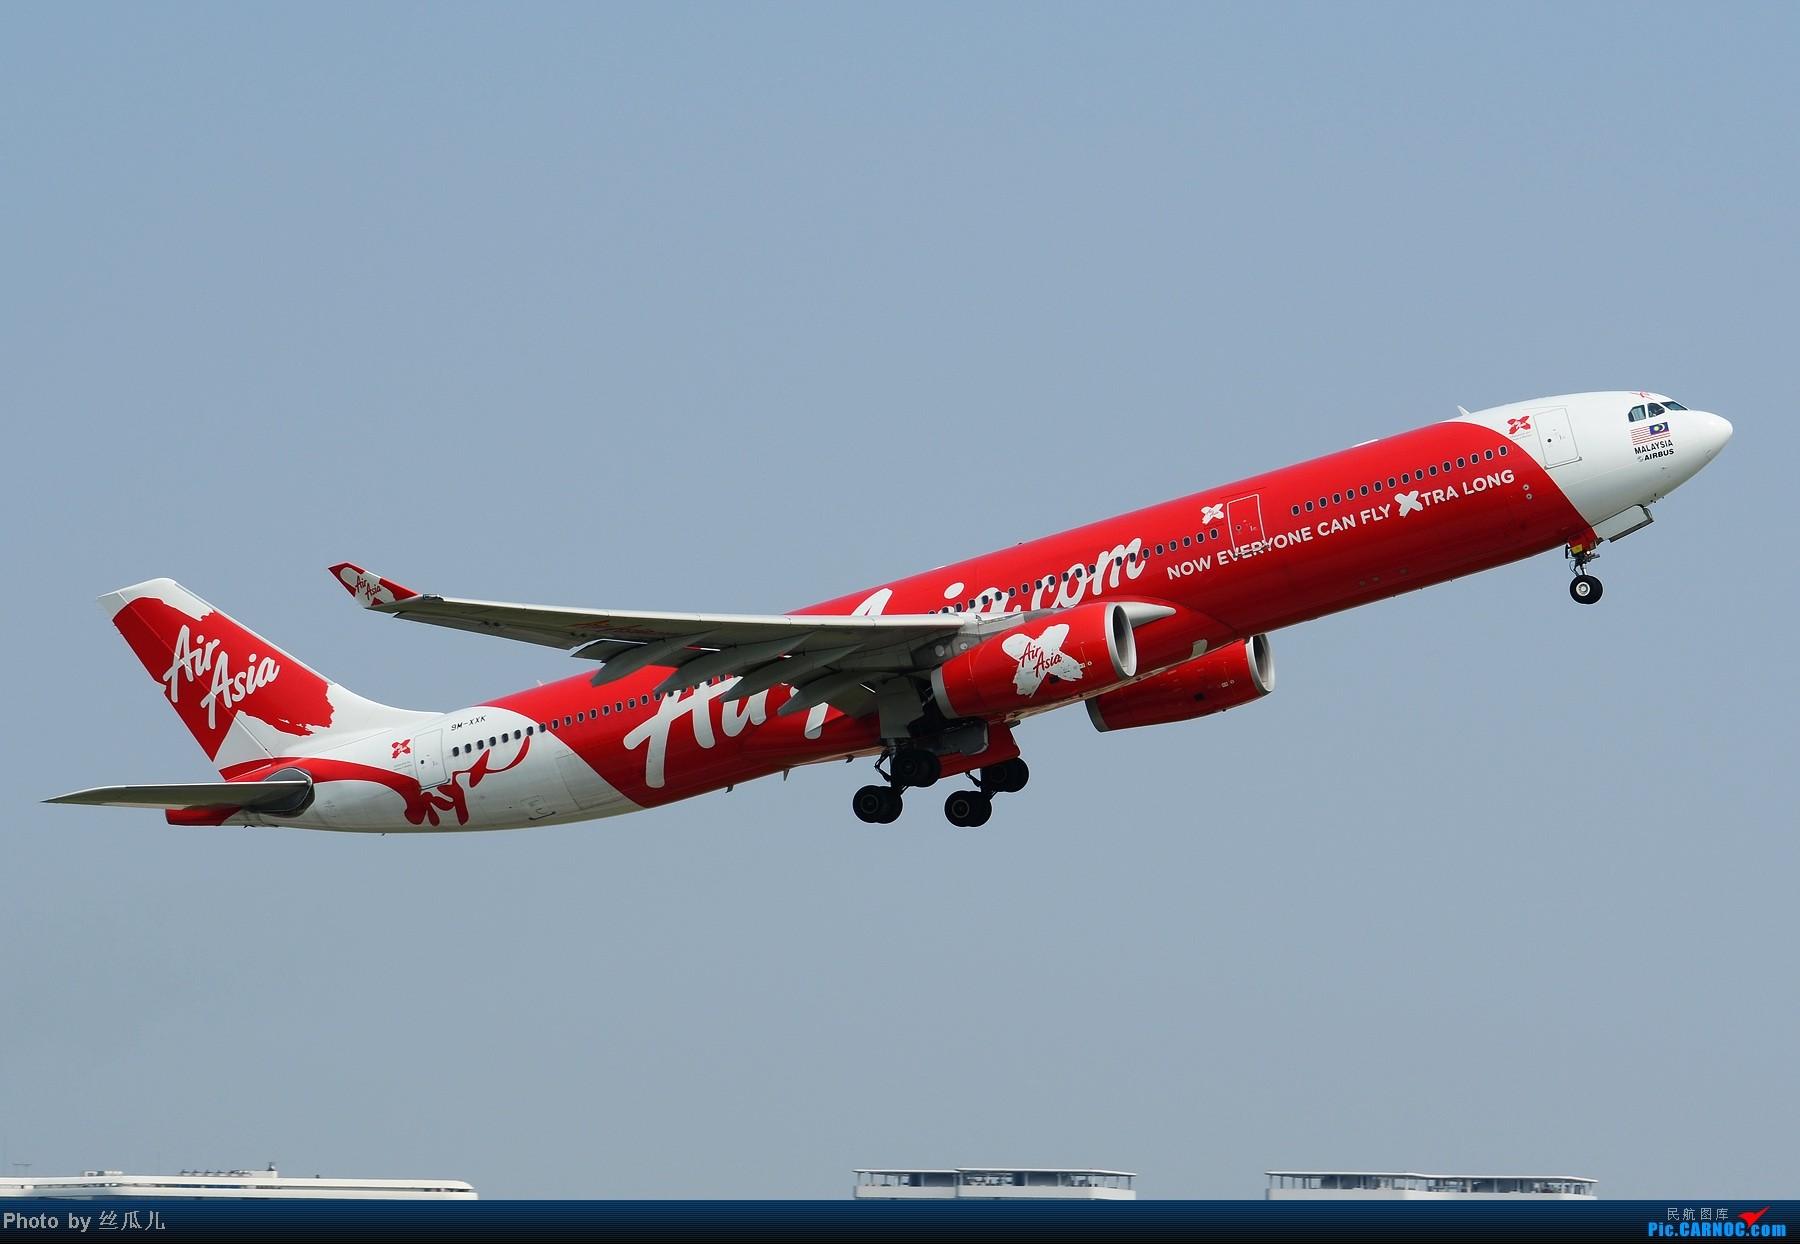 Re:[原创][原创]【徘徊在HGH的丝瓜】端午节福利--XXK套图,不喜误入,后果自负! AIRBUS A330-343 9M-XXK 中国杭州萧山机场